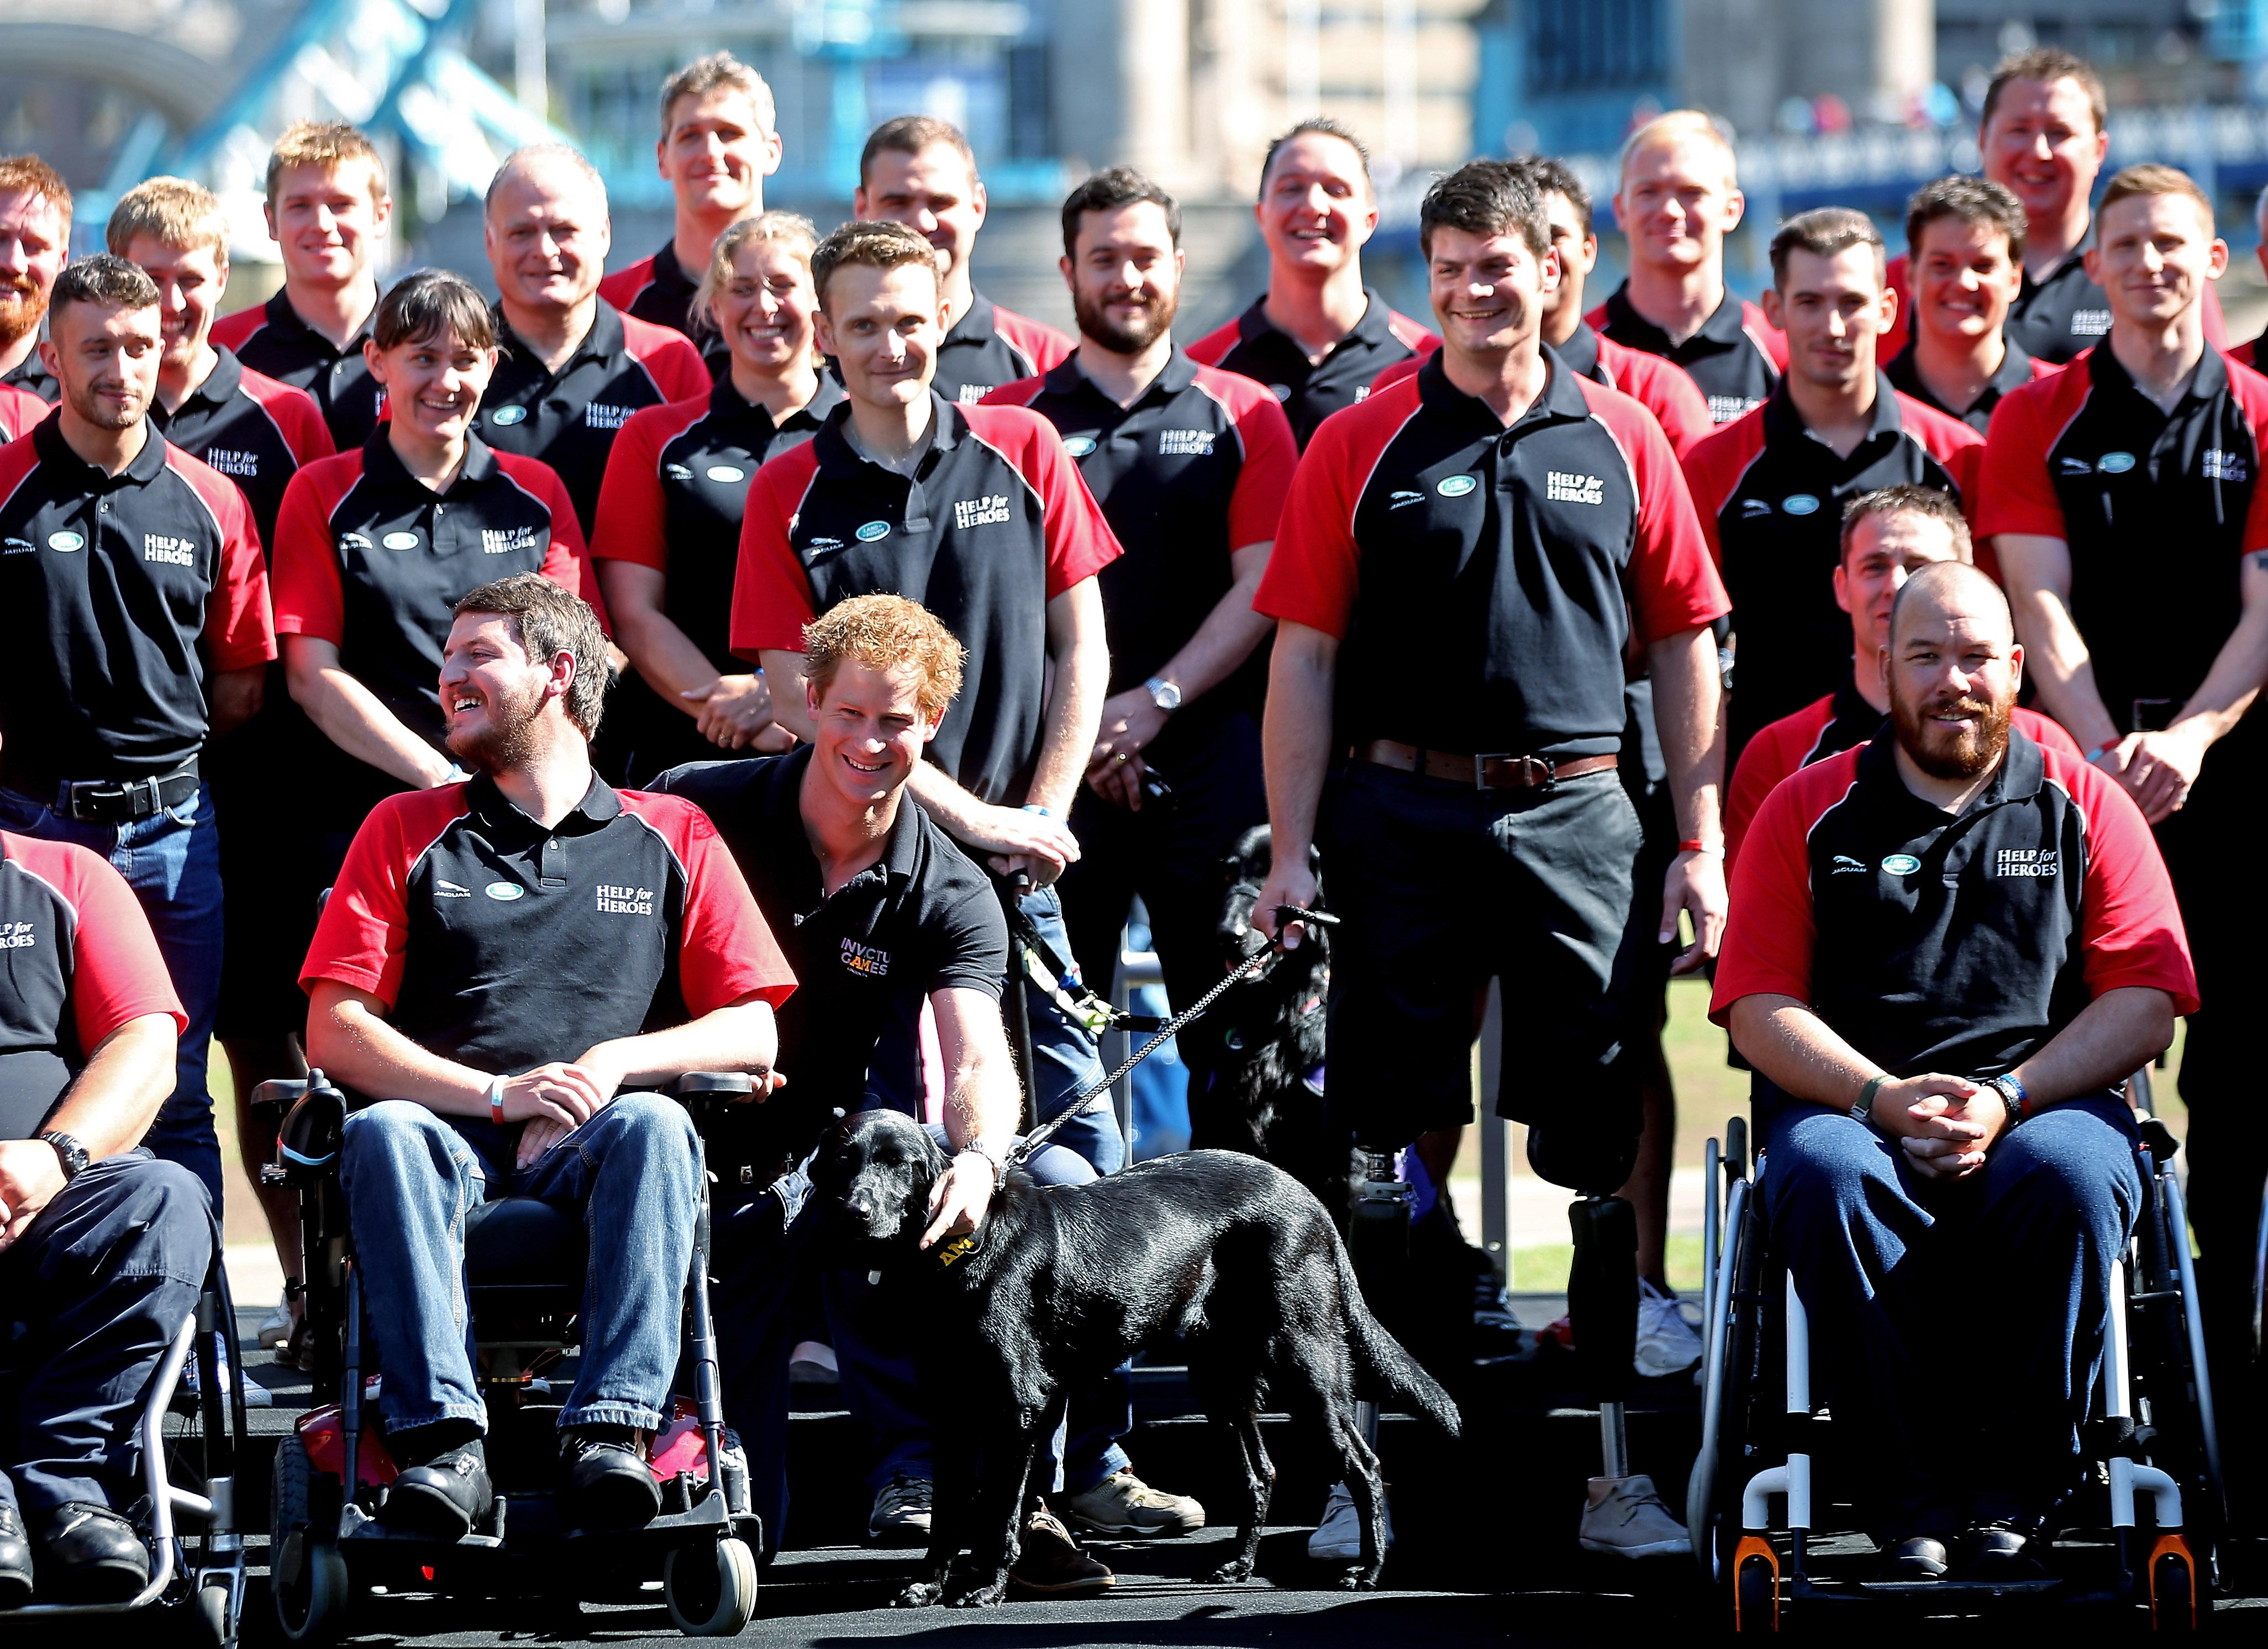 Jaguar Land Rover Presents British Team For The Invictus Games